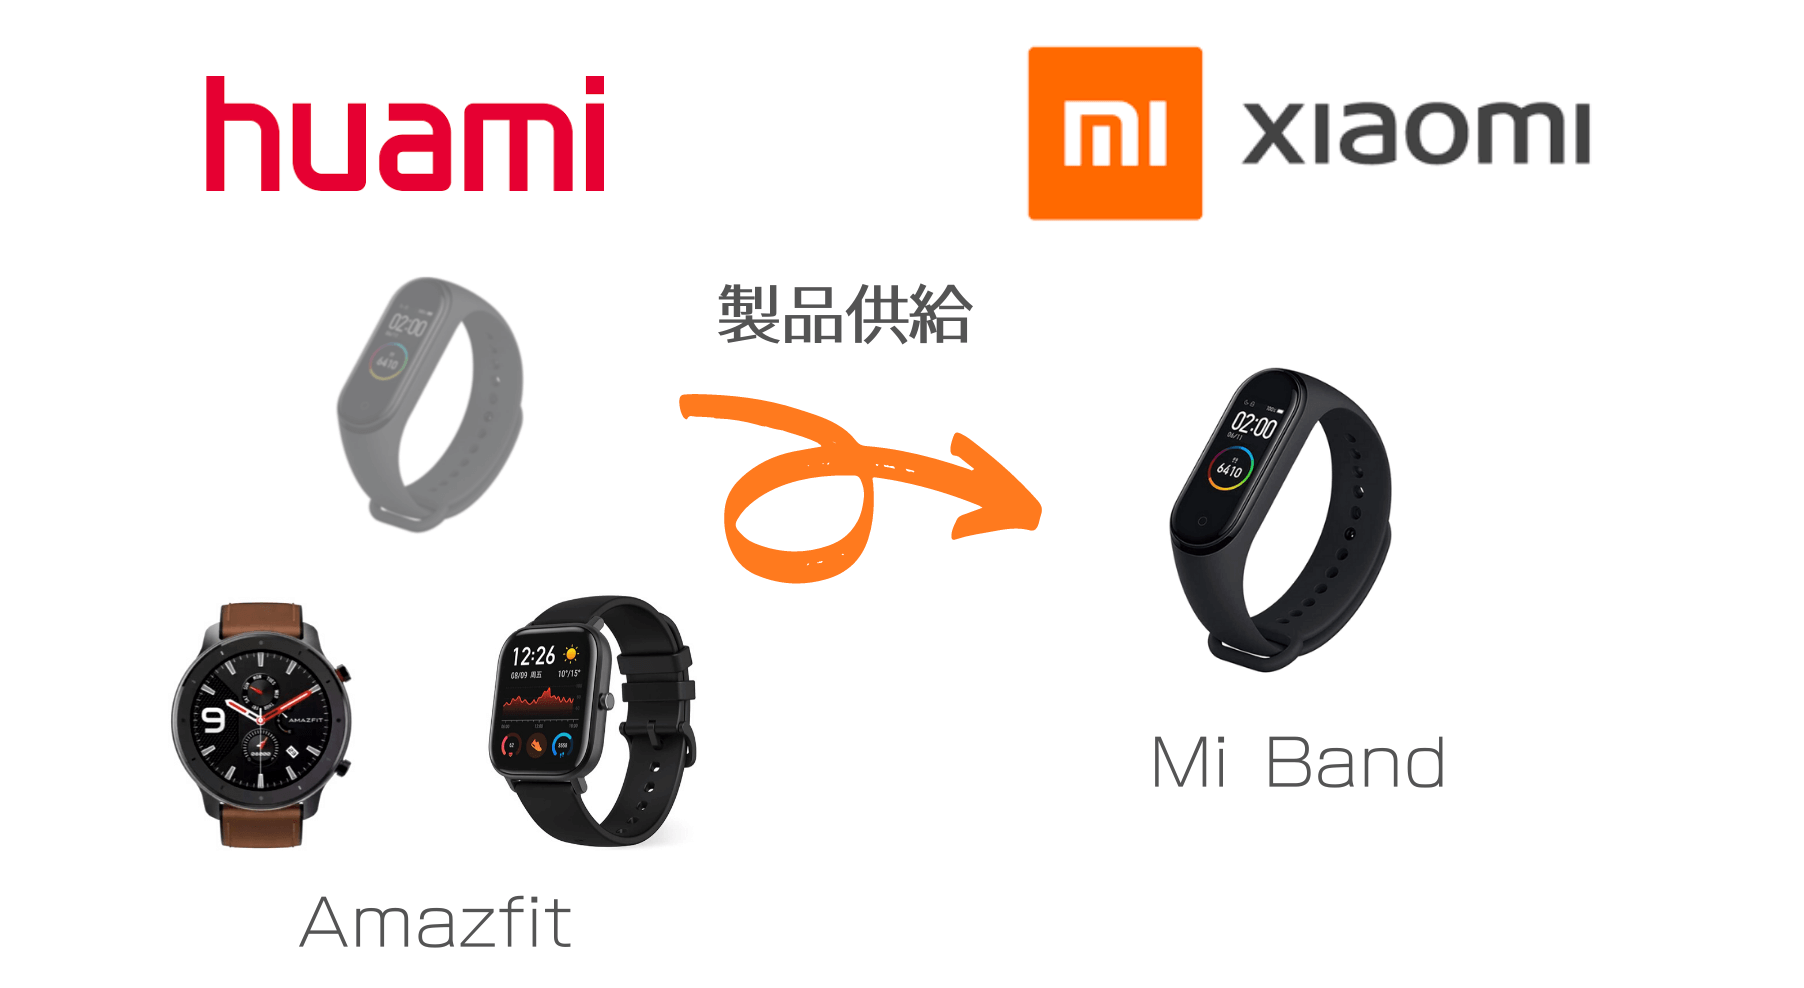 XiaomiとHuamiにおけるMi Bandの関係